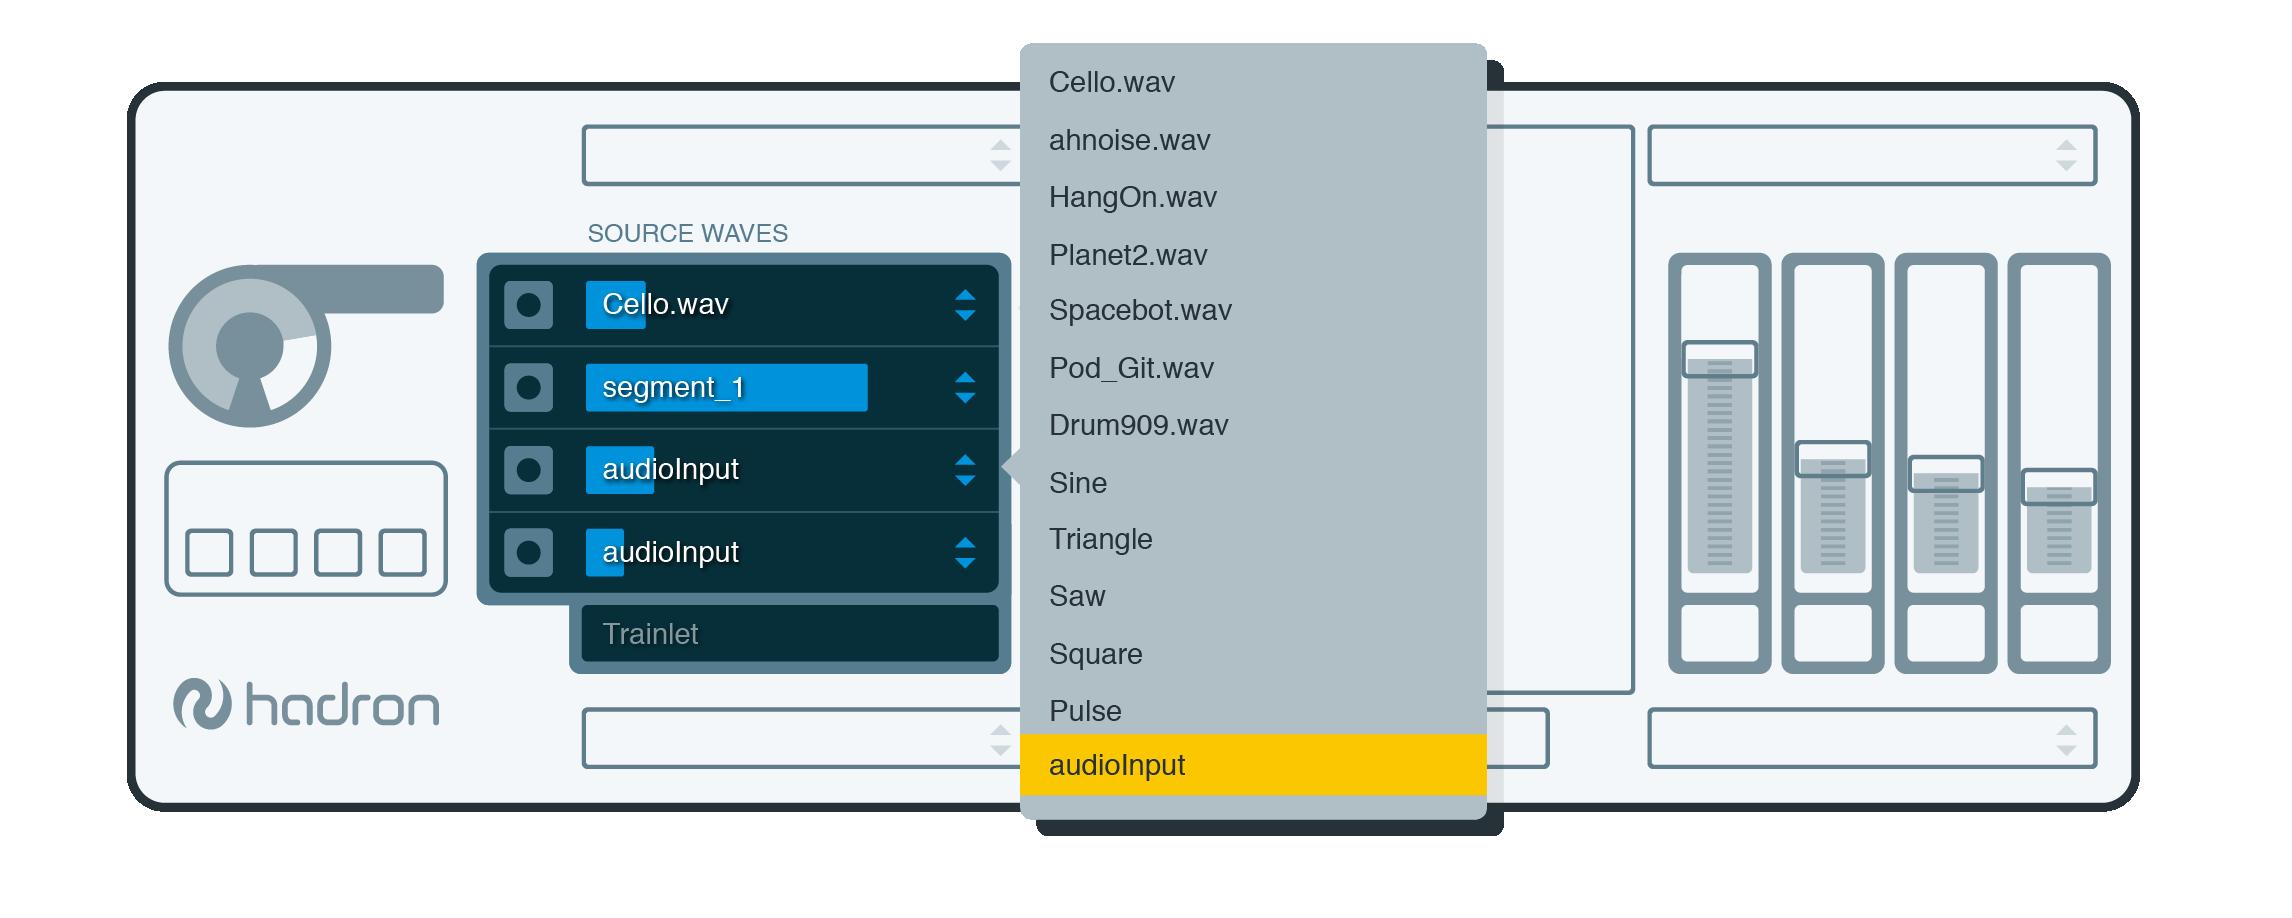 pa_feature-audioinput.png